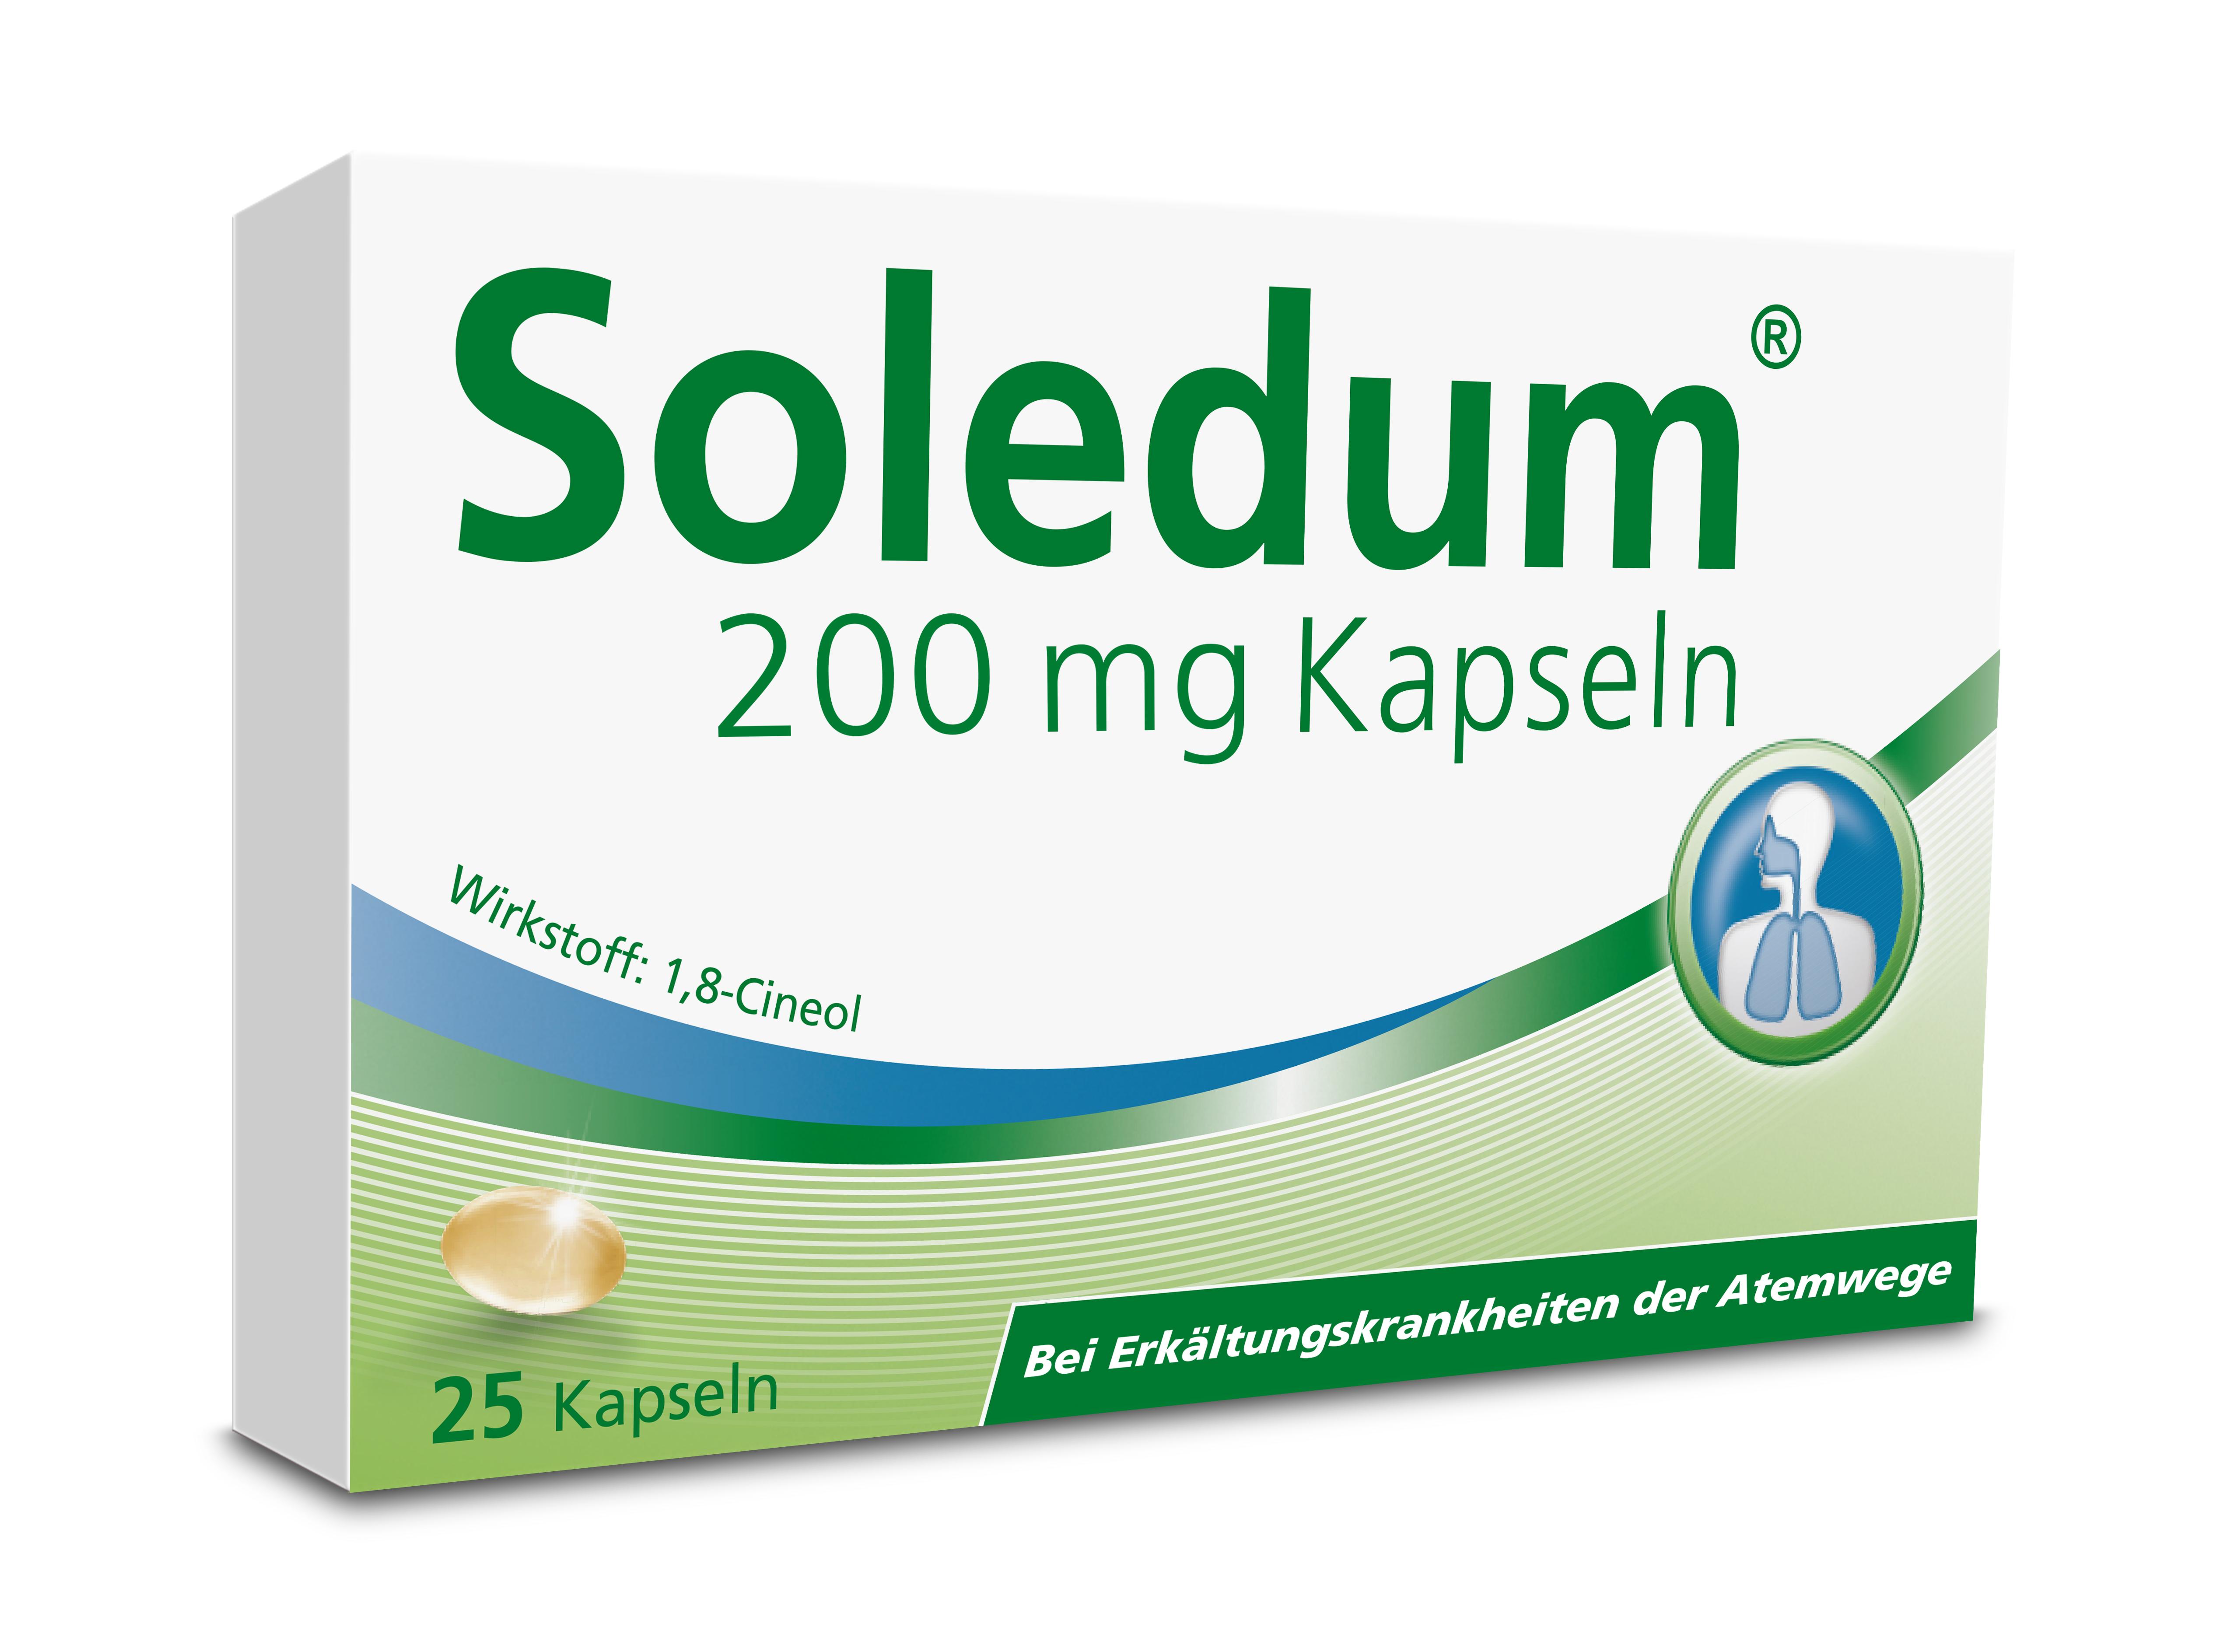 Soledum 200 mg - Kapseln